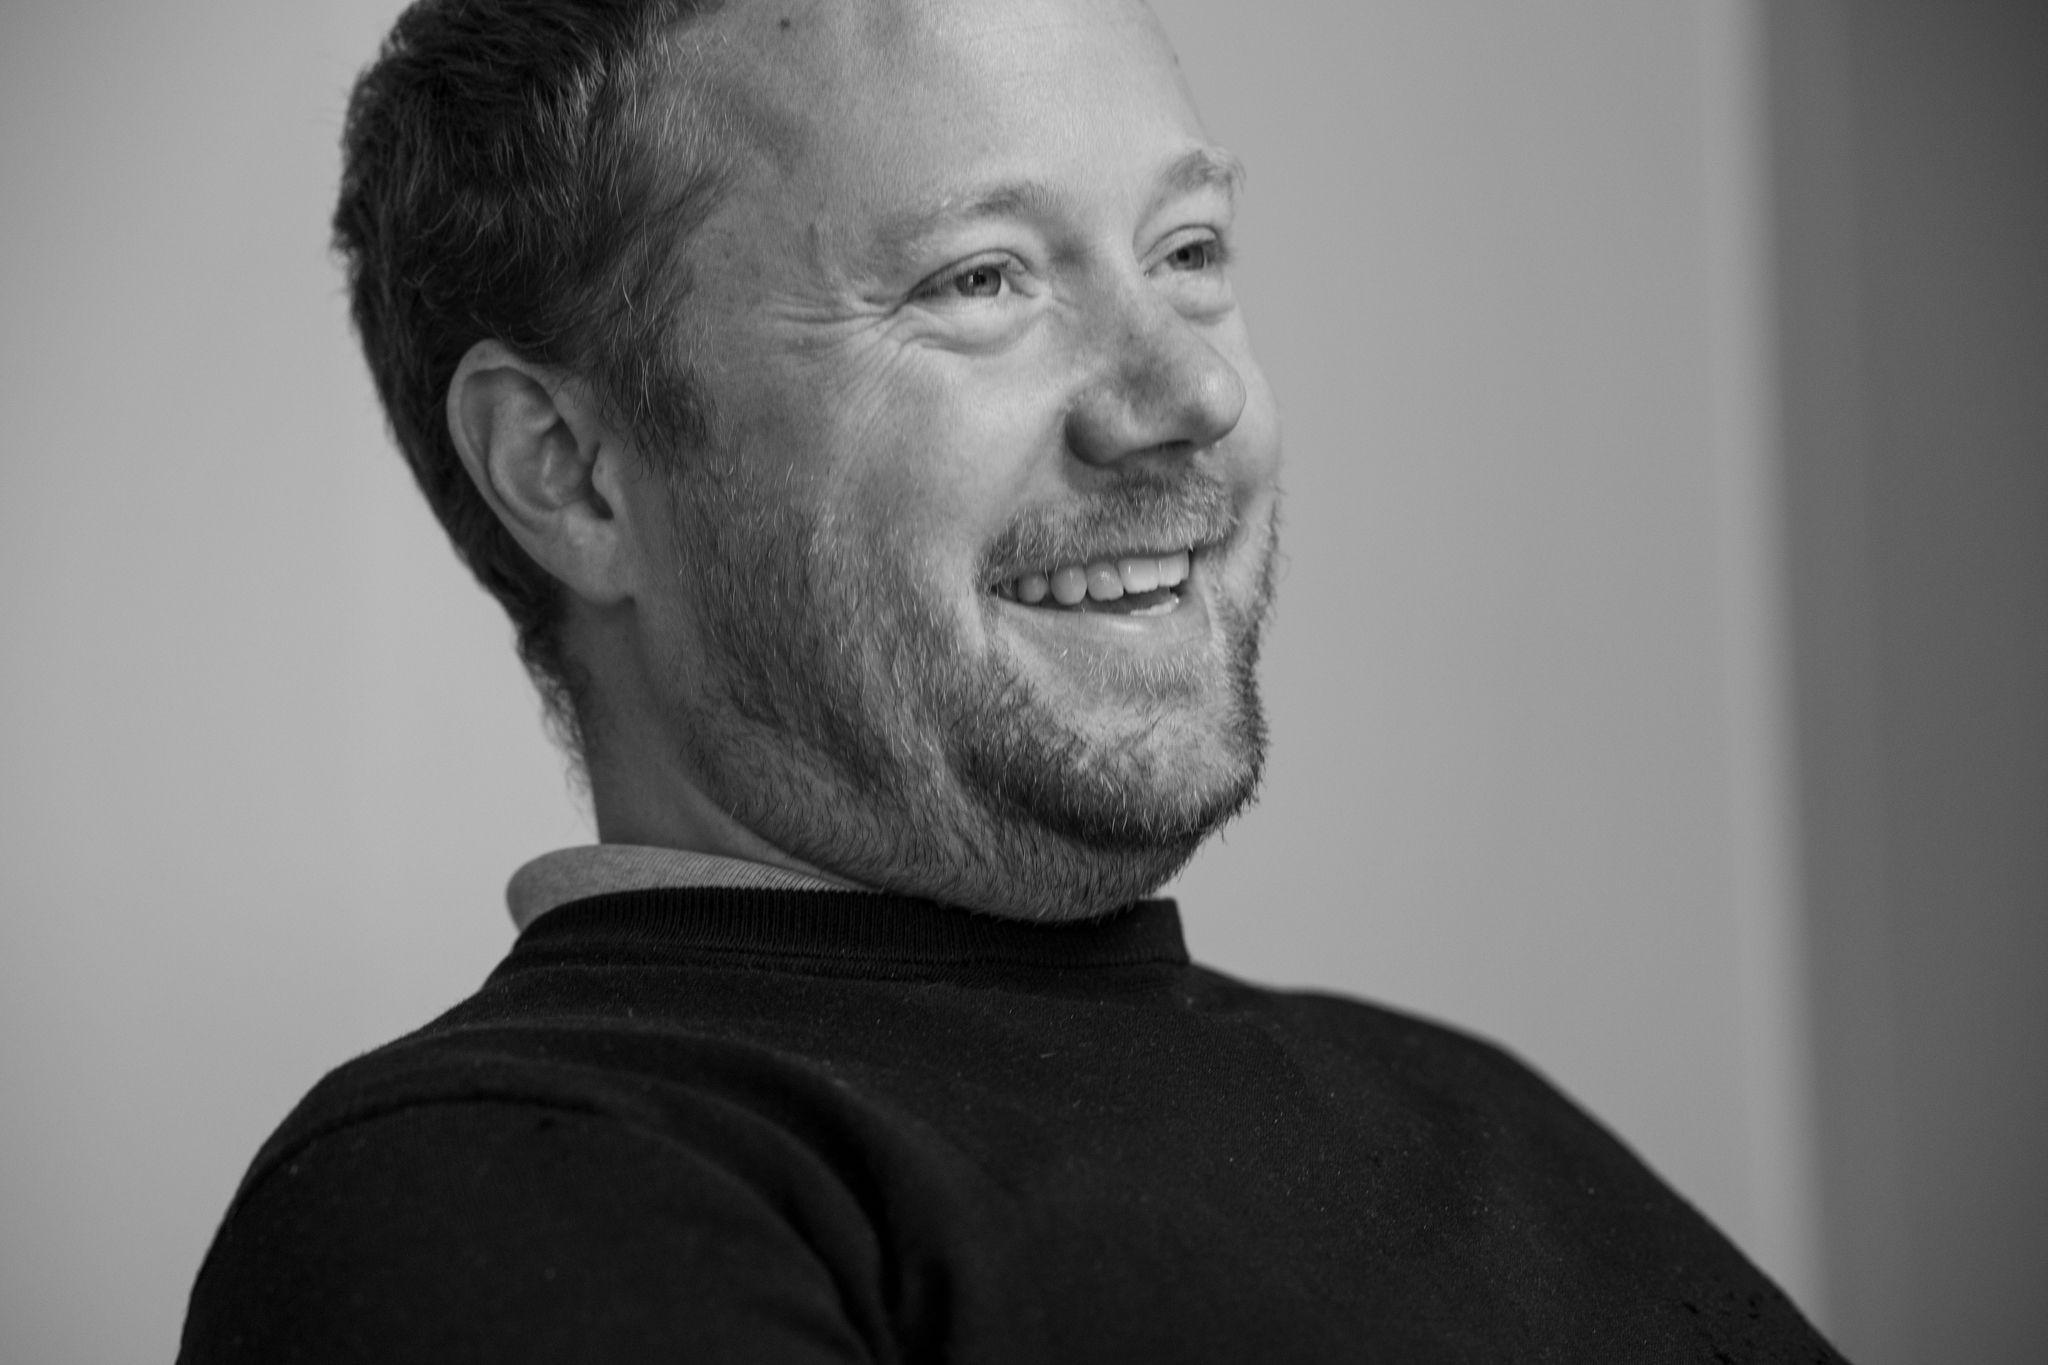 Photo of Hallgeir Knutsen